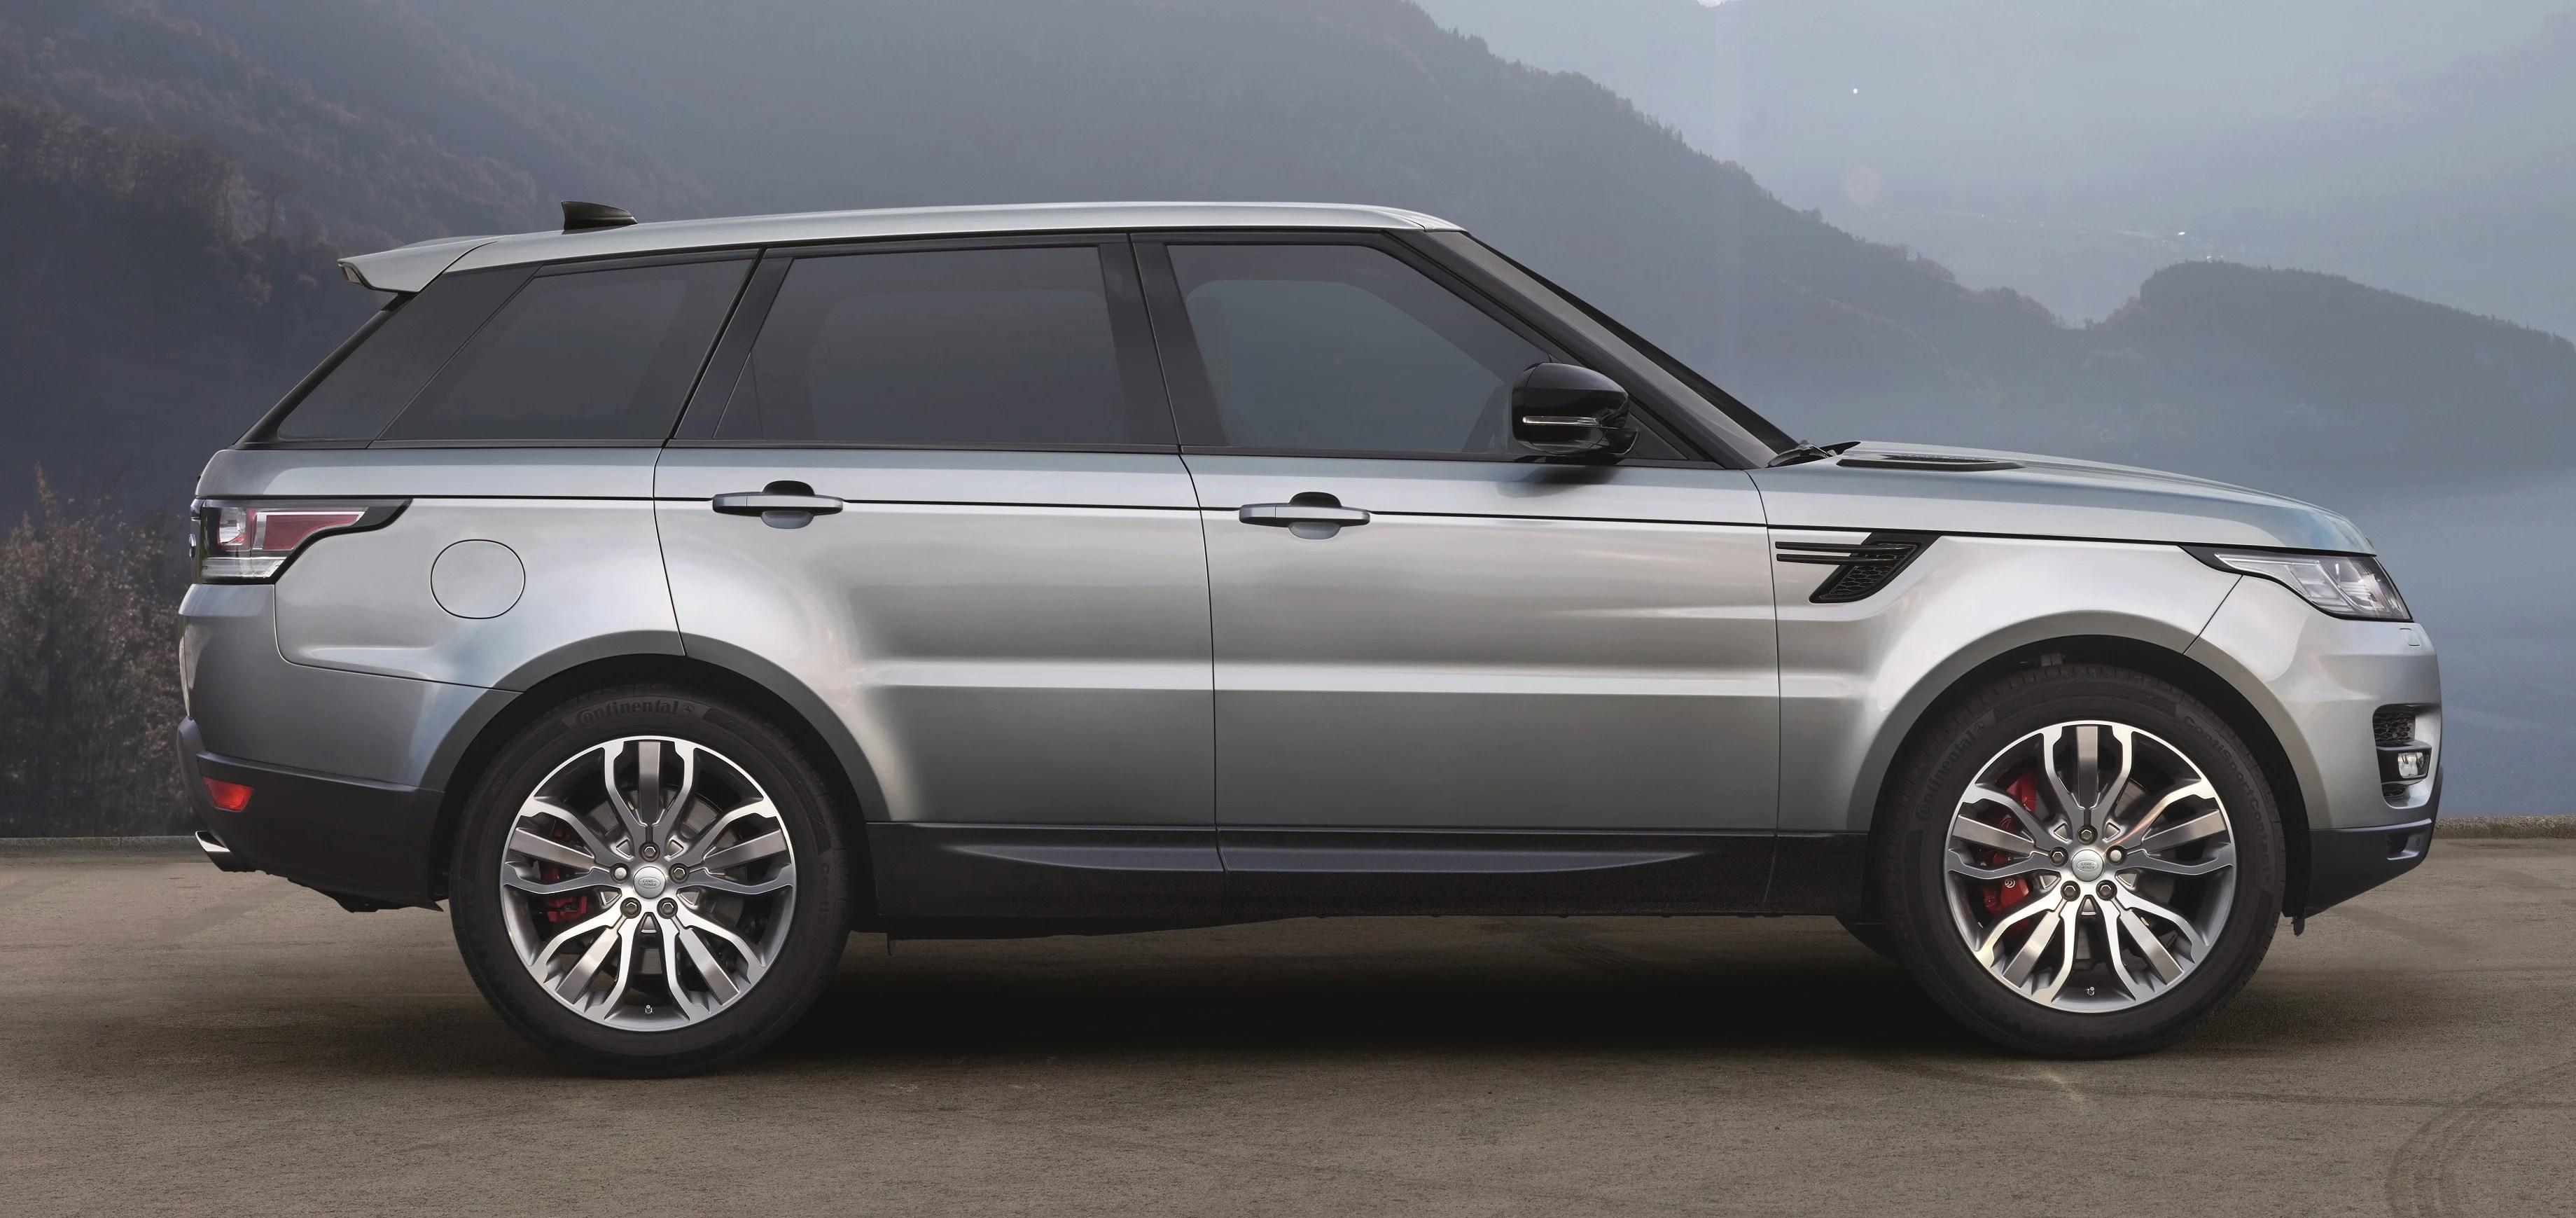 Range Rover Sport Turbo Auto Express